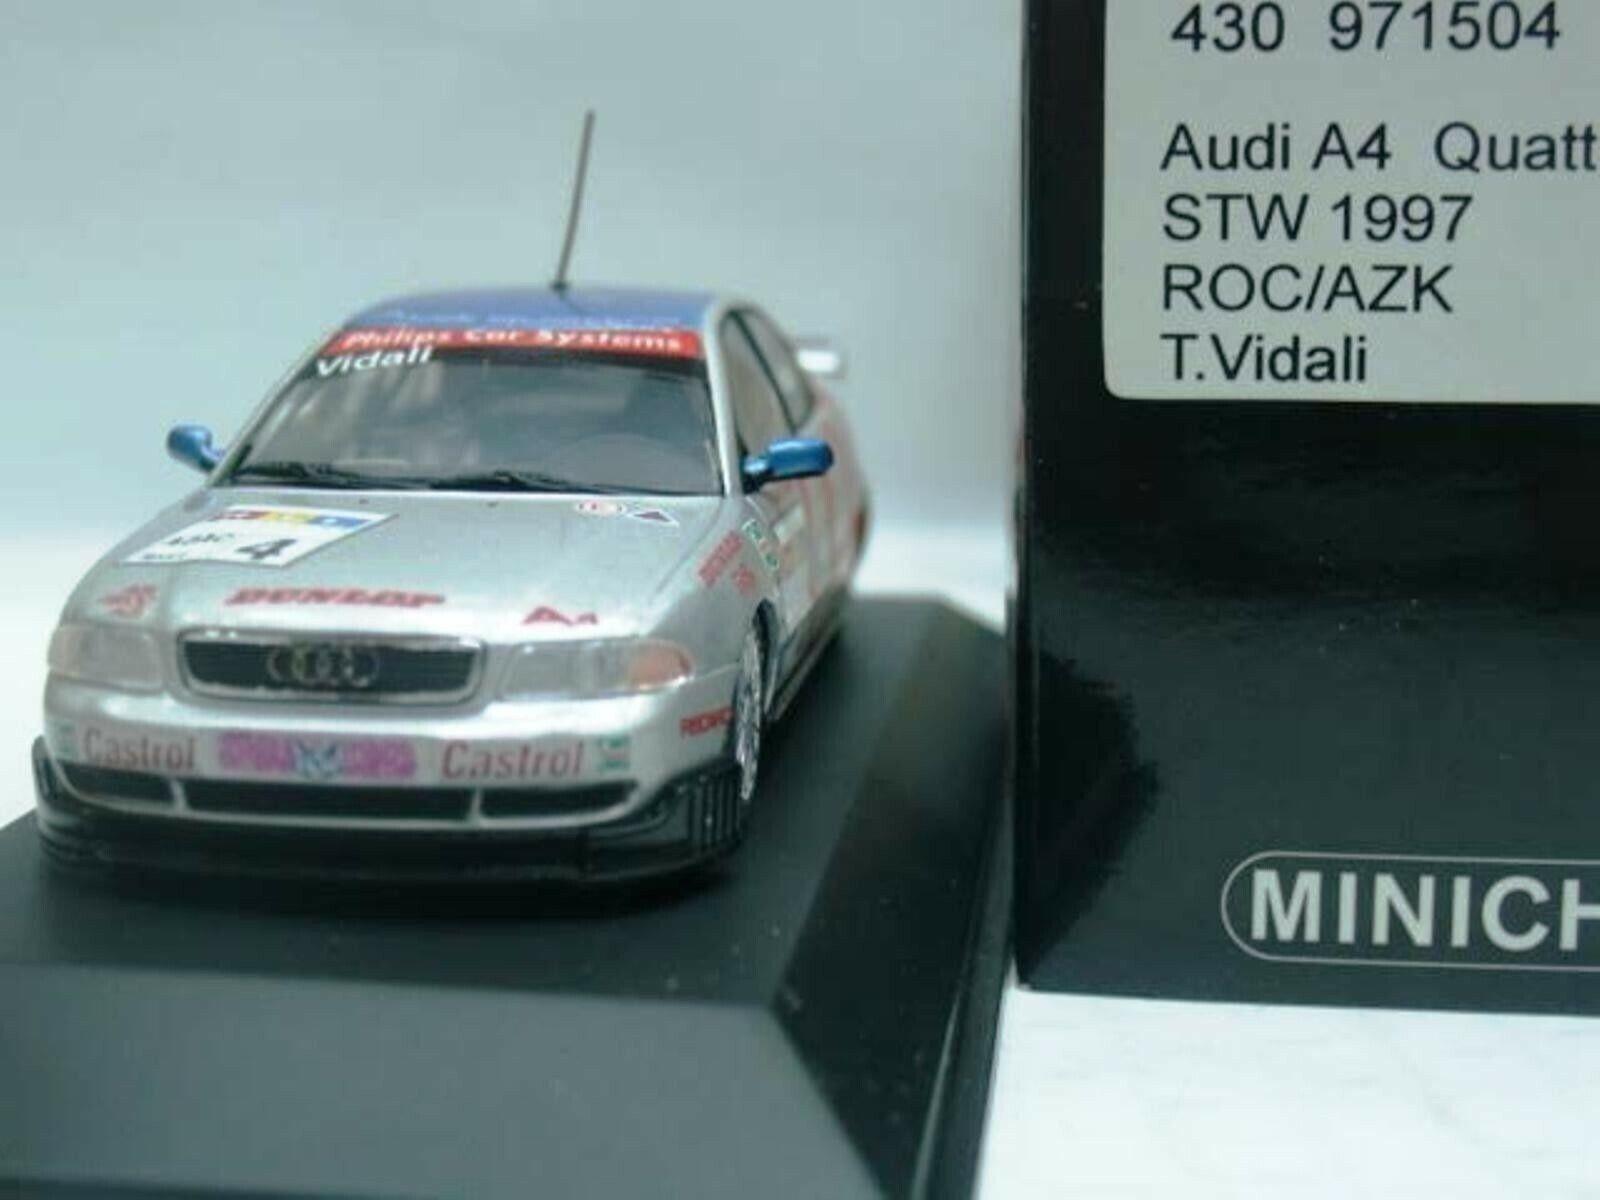 WOW estremamente raro AUDI A4 quattro 1997  4 VIDALI Norisring STW 1 43 Minichamps